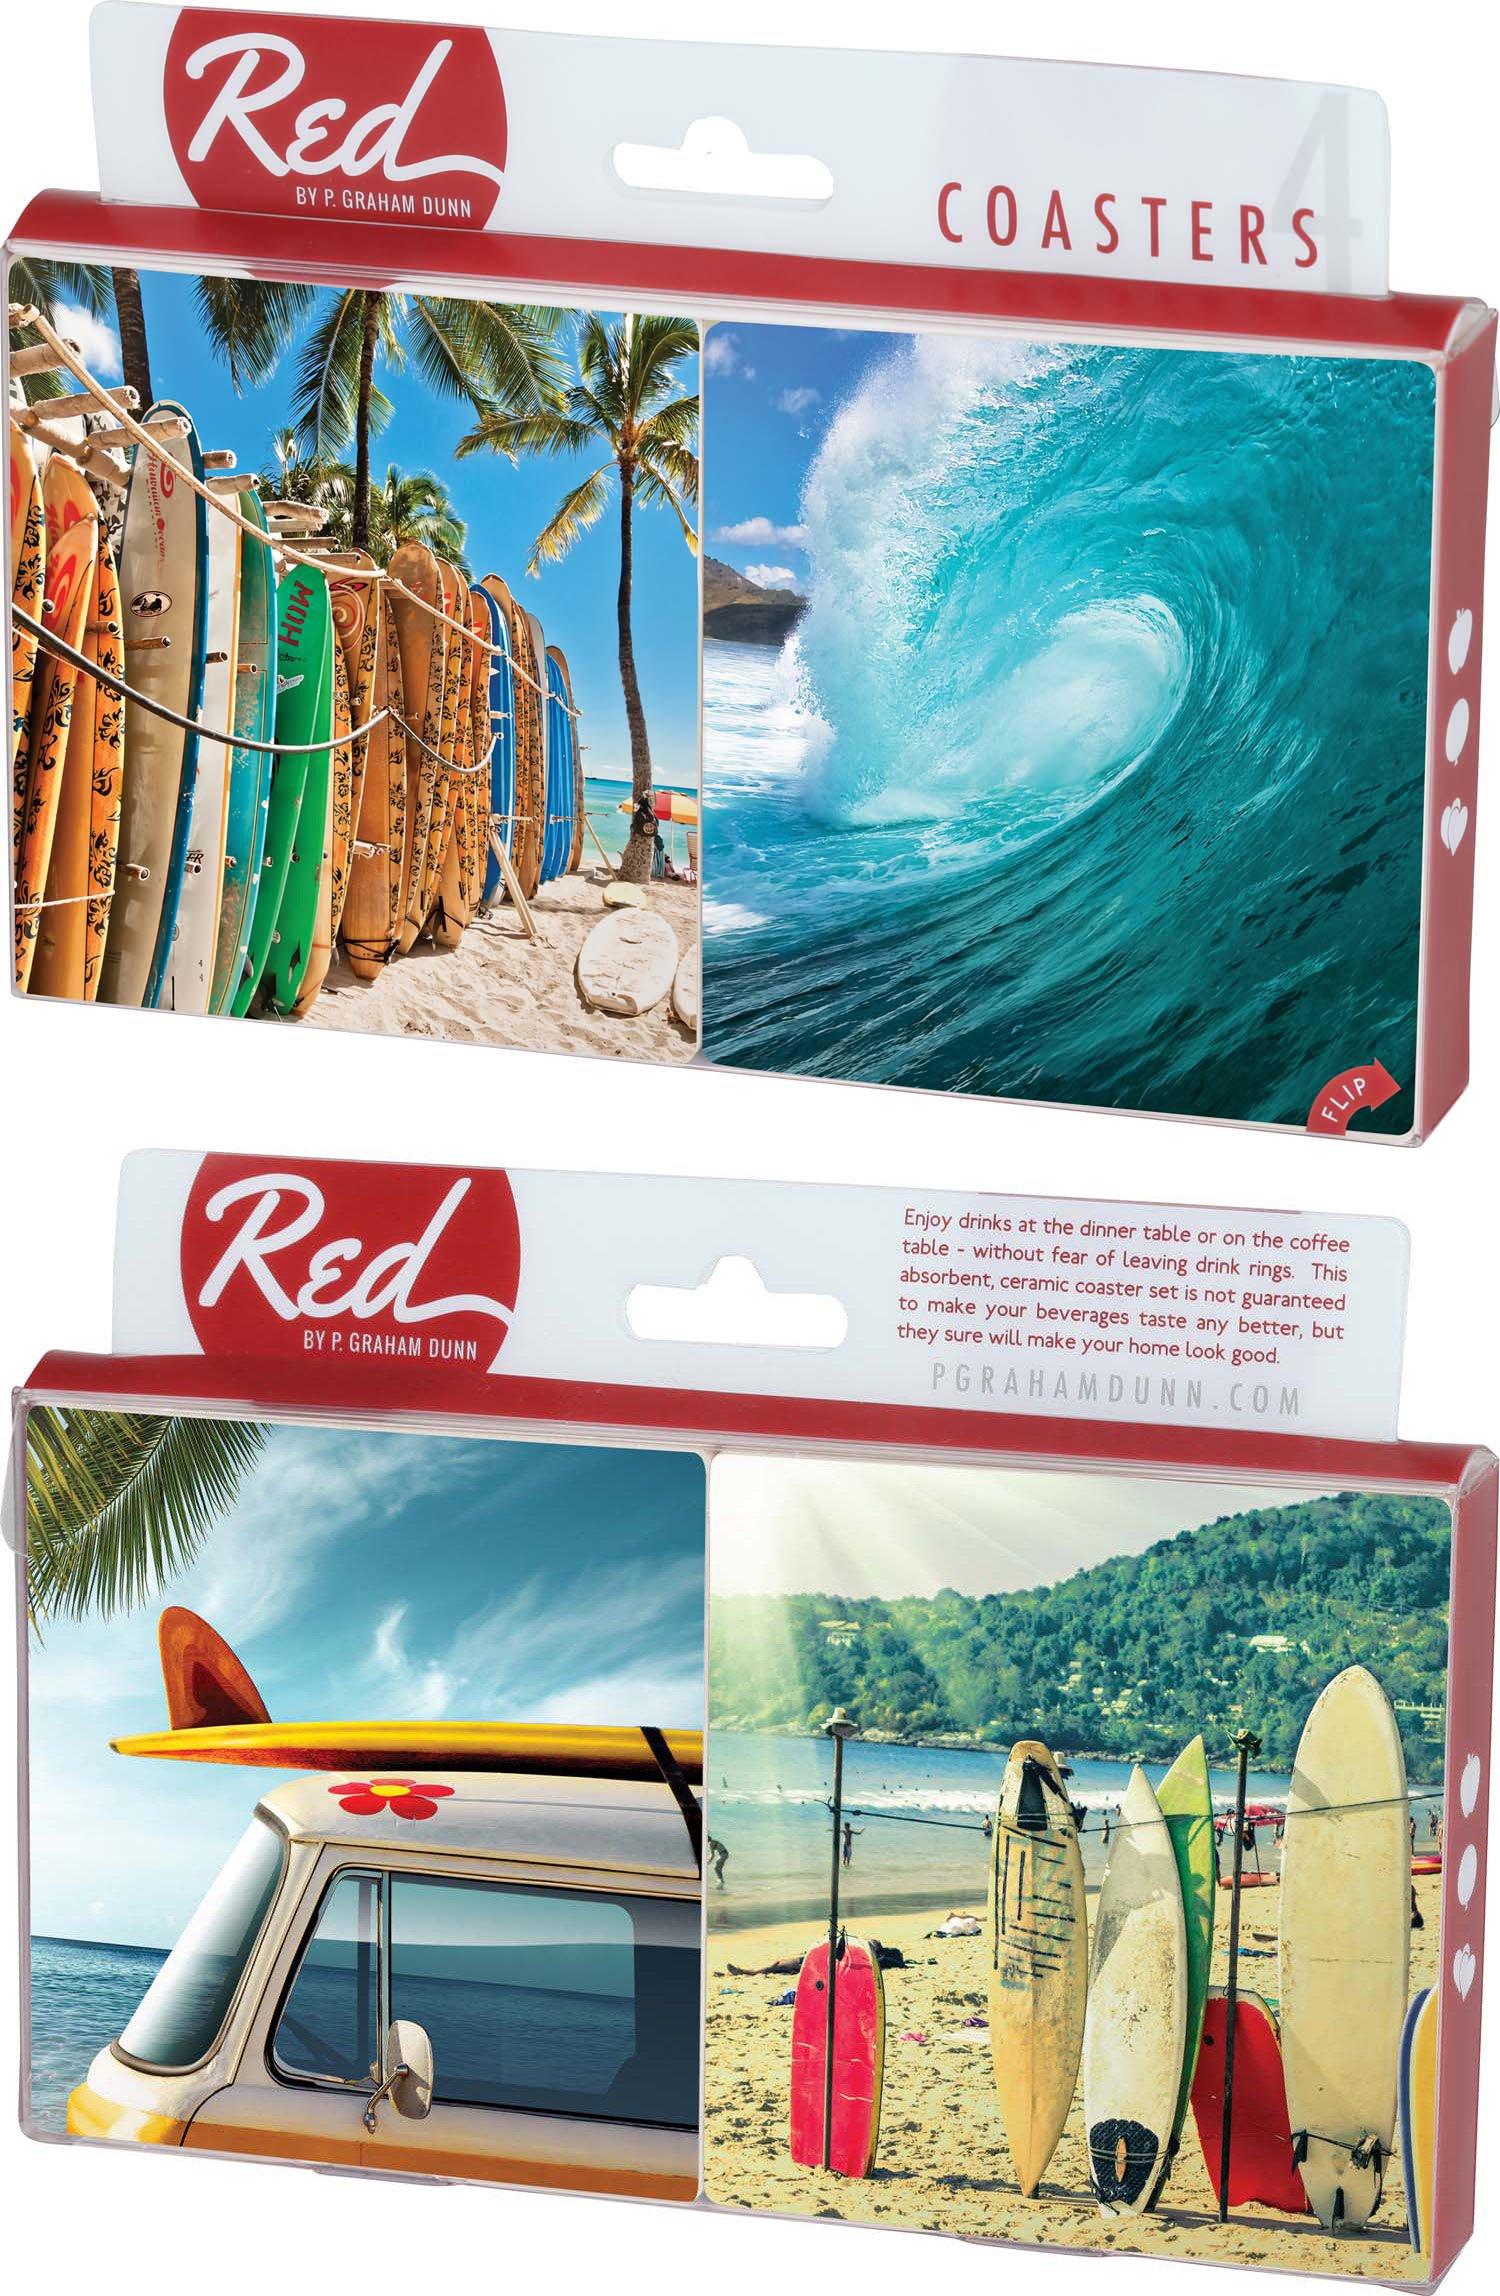 Ocean Surfboards 4 Piece Absorbent Ceramic Coaster Set